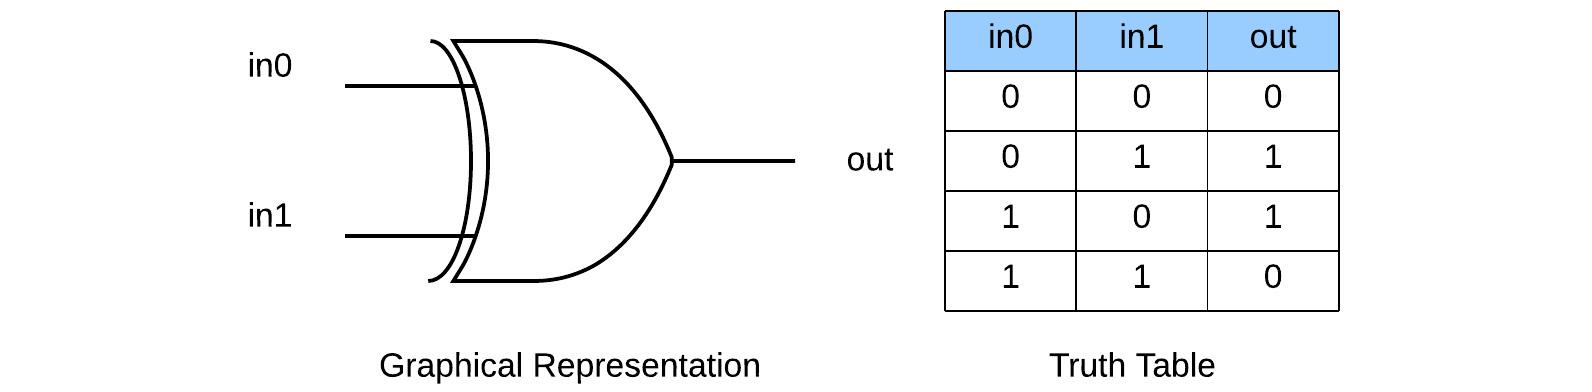 Figure 1.5 – XOR gate representation